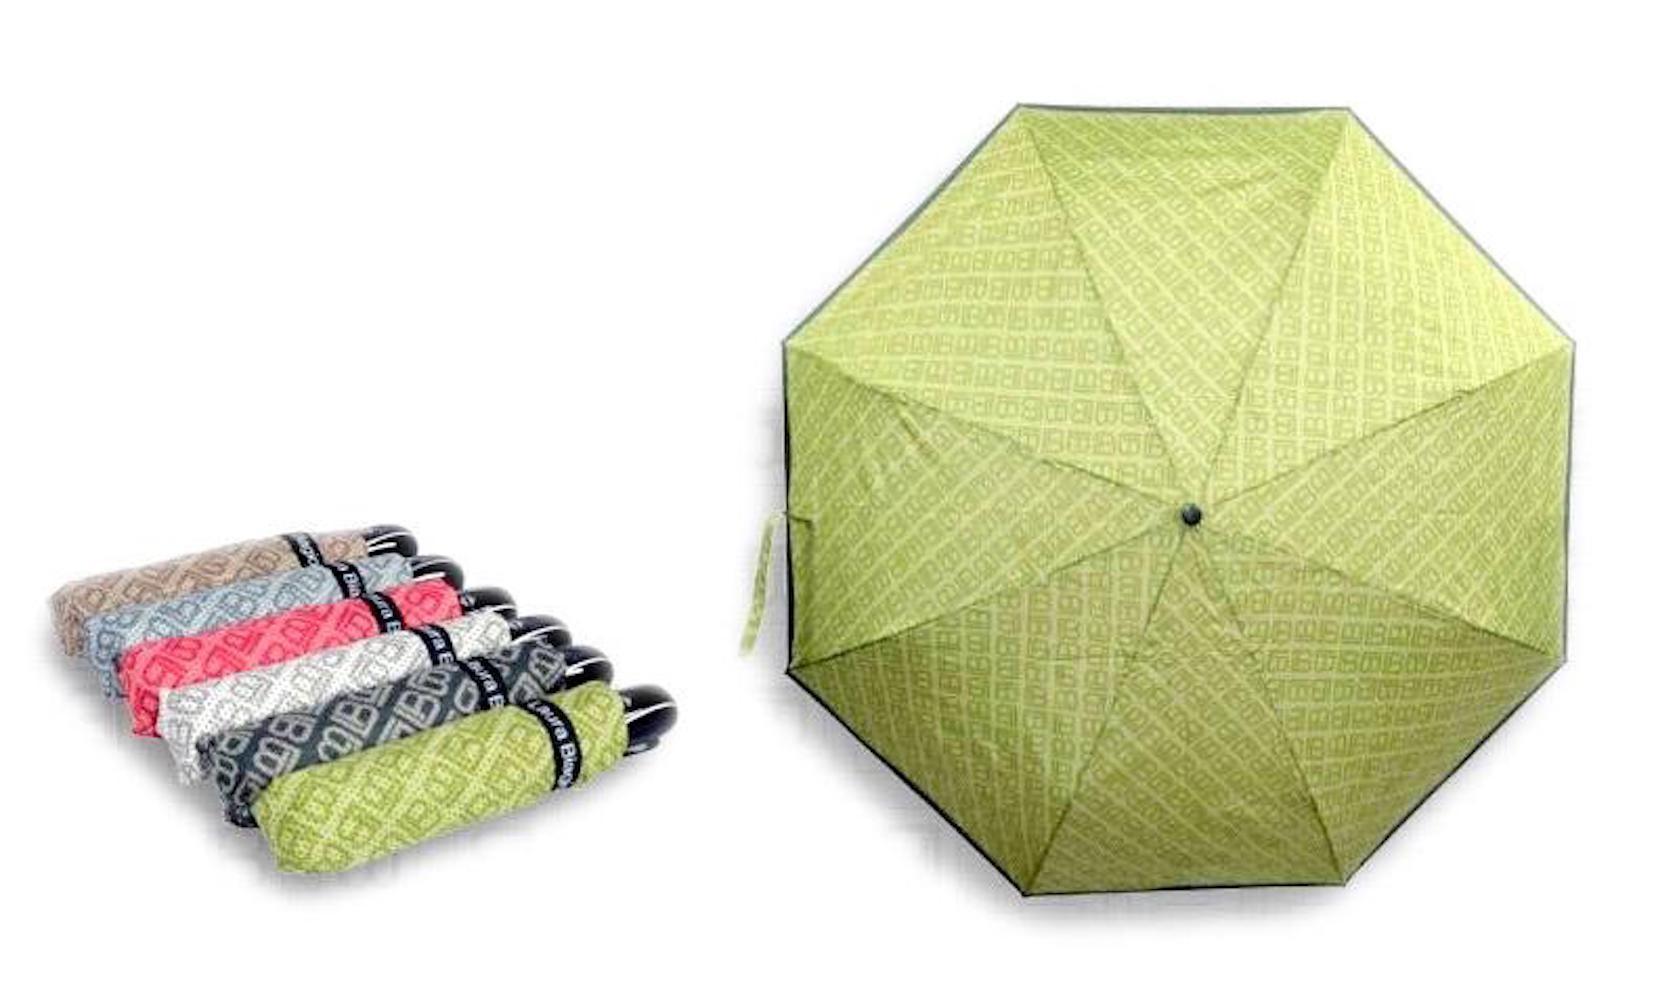 Deštník Laura Biagiotti 3 hnědá